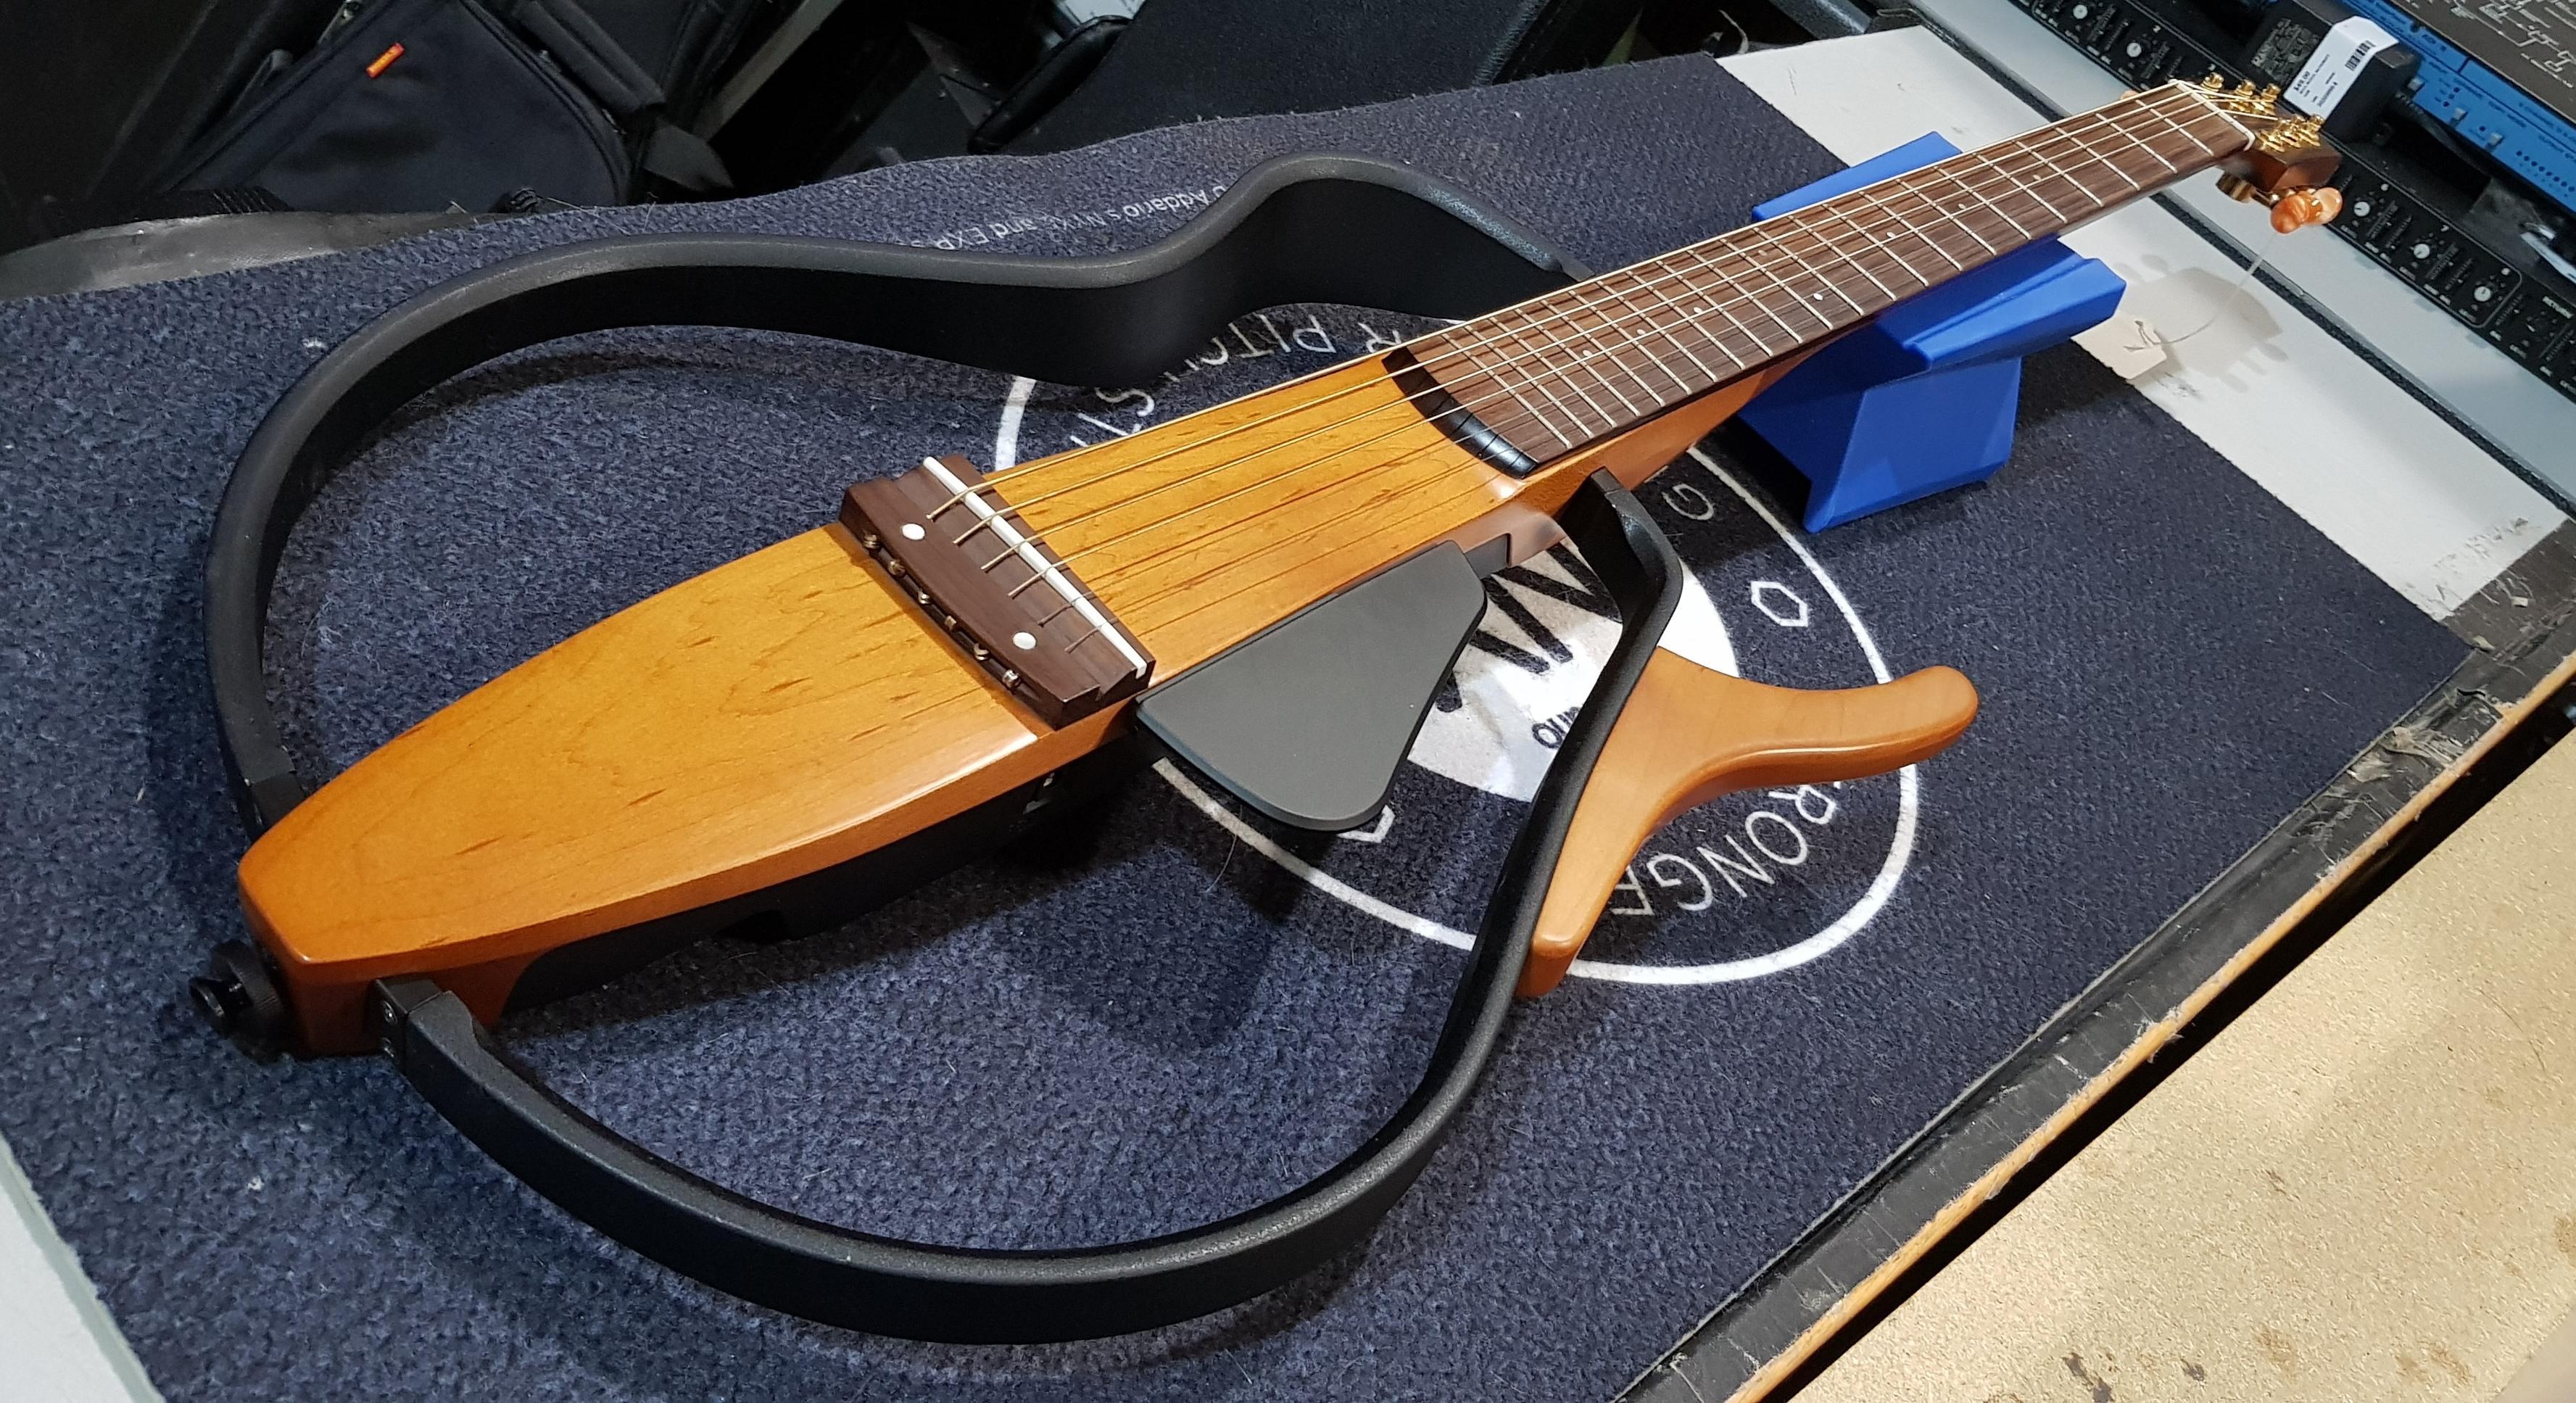 YAMAHA SILENT GUITAR Model SLG 110S w/ Bag